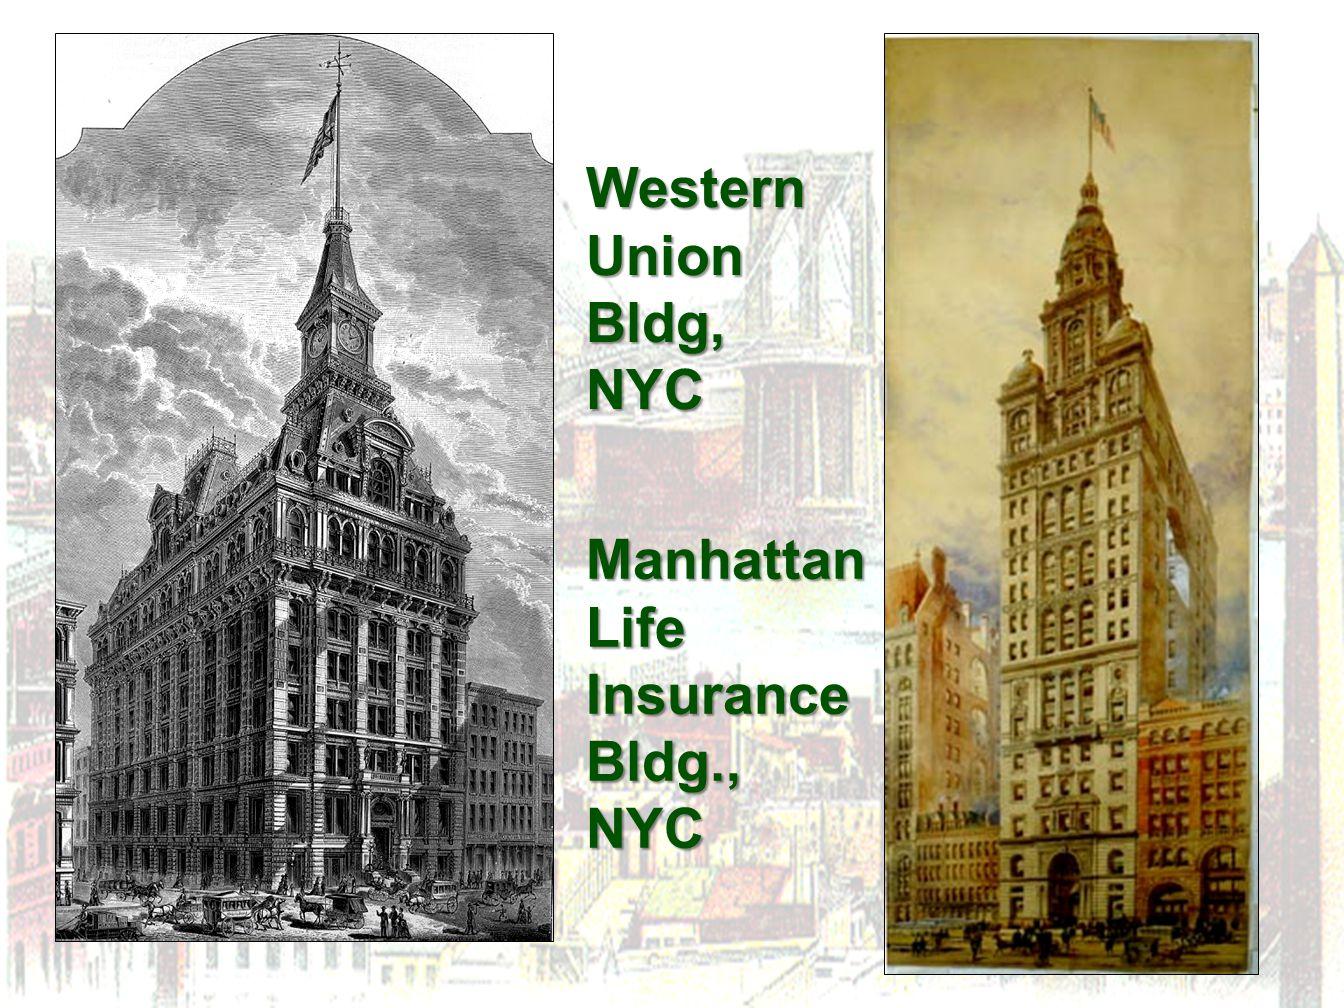 Western Union Bldg, NYC Manhattan Life Insurance Bldg., NYC